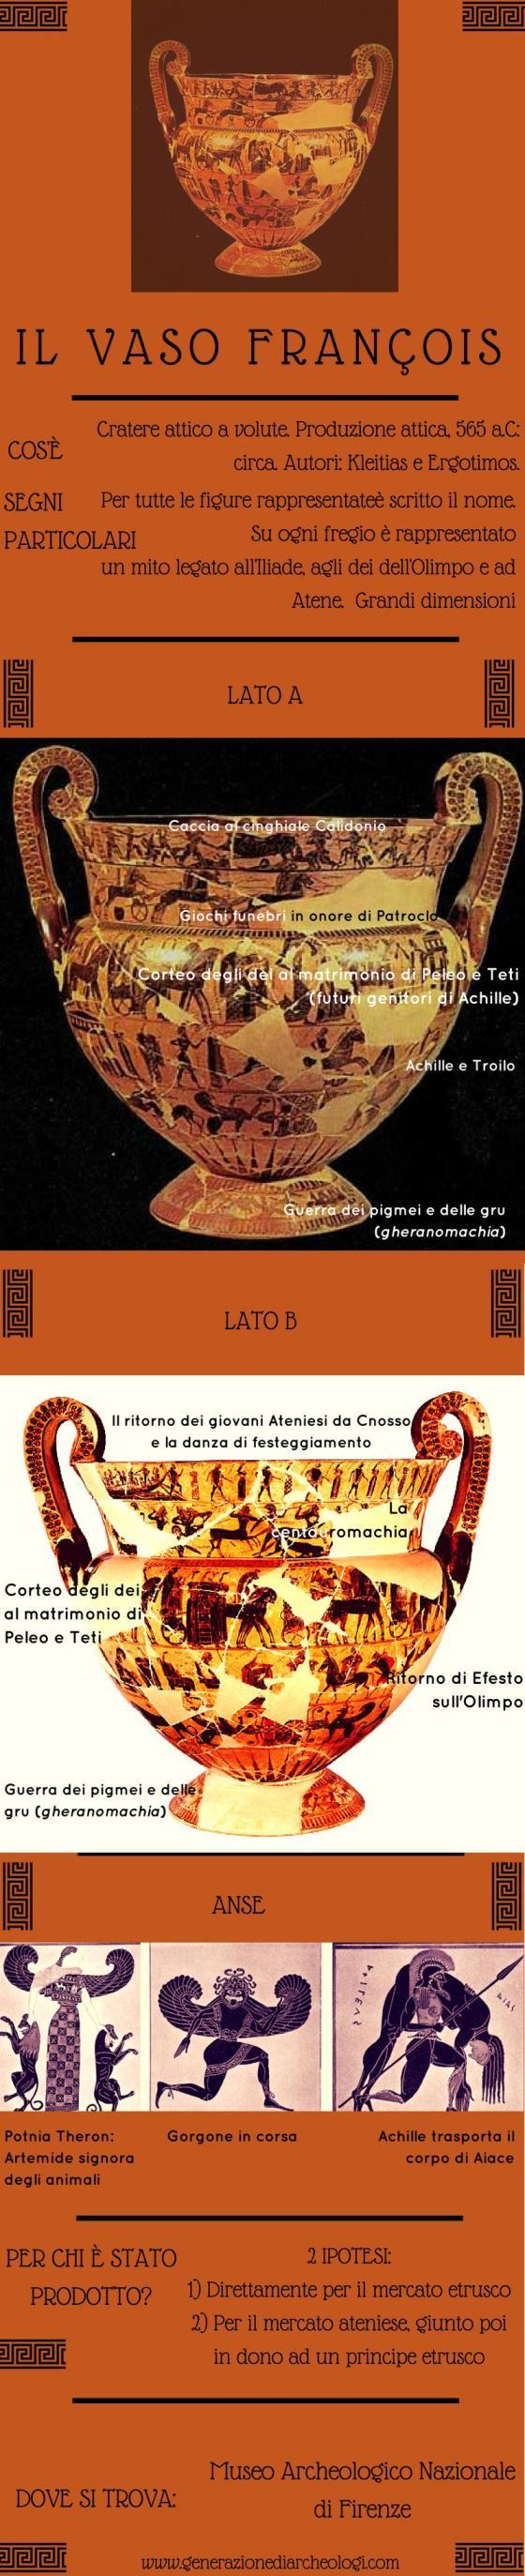 vaso françois infografica